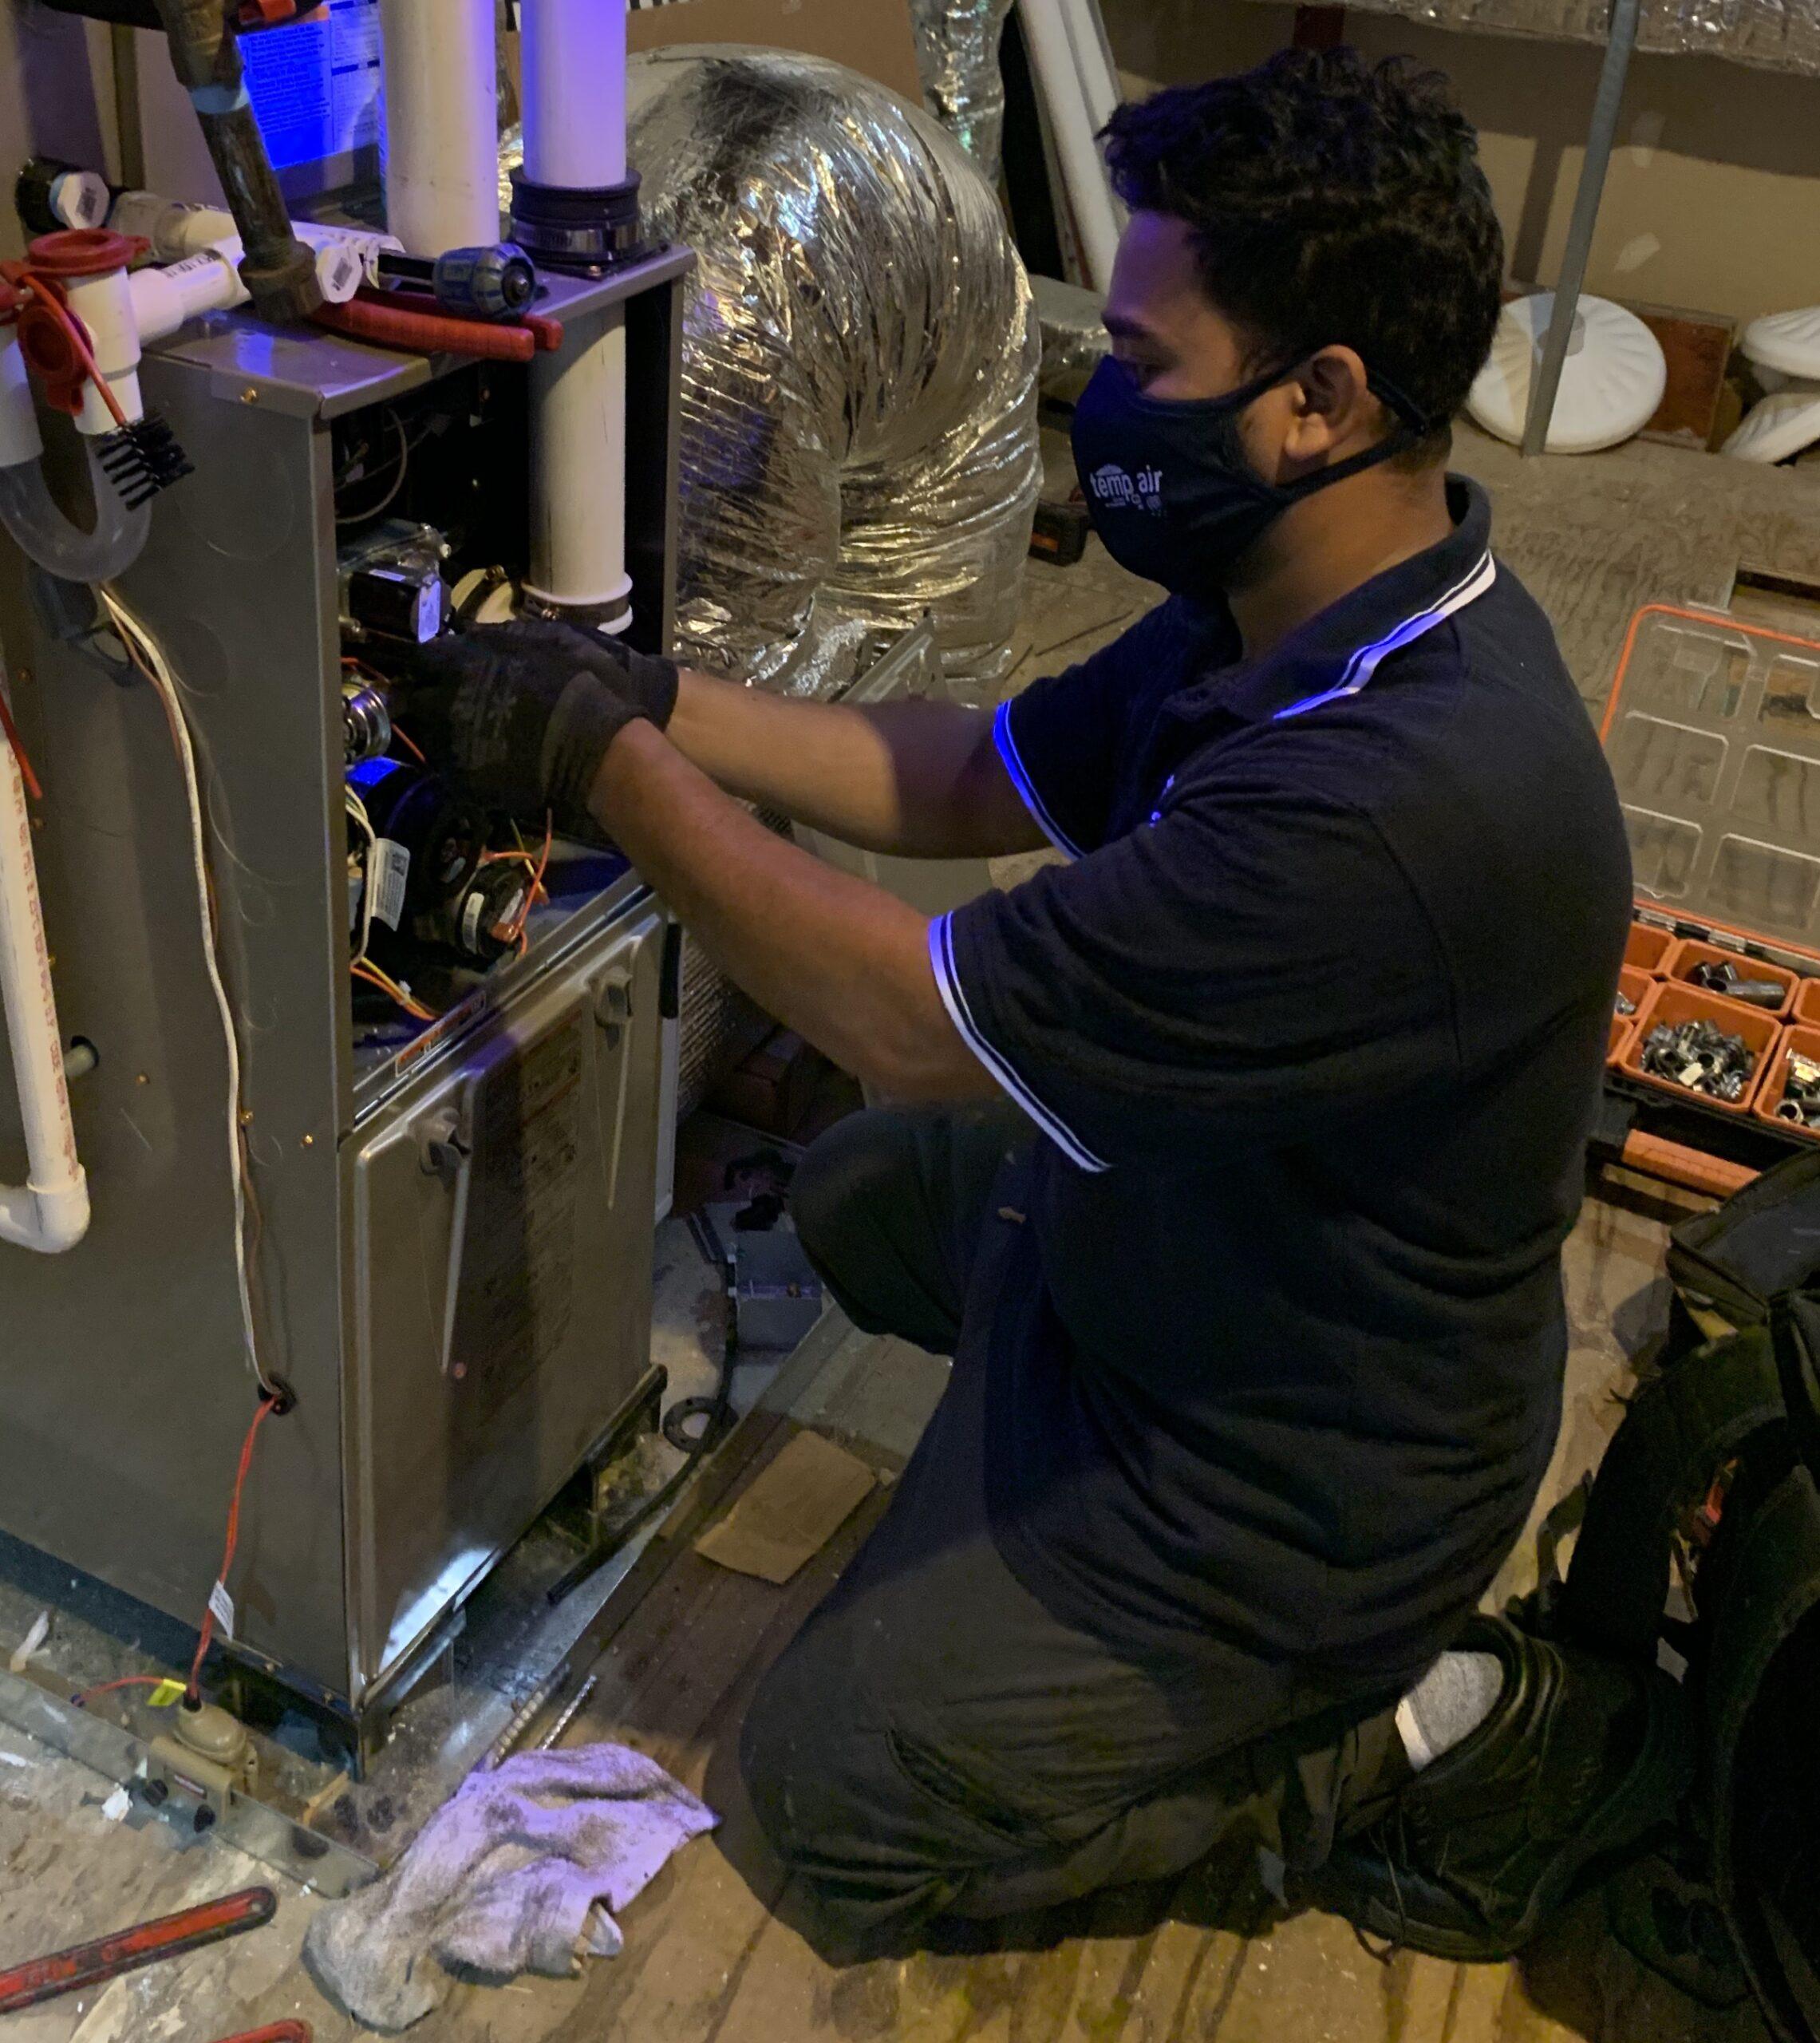 Experienced HVAC service technicians